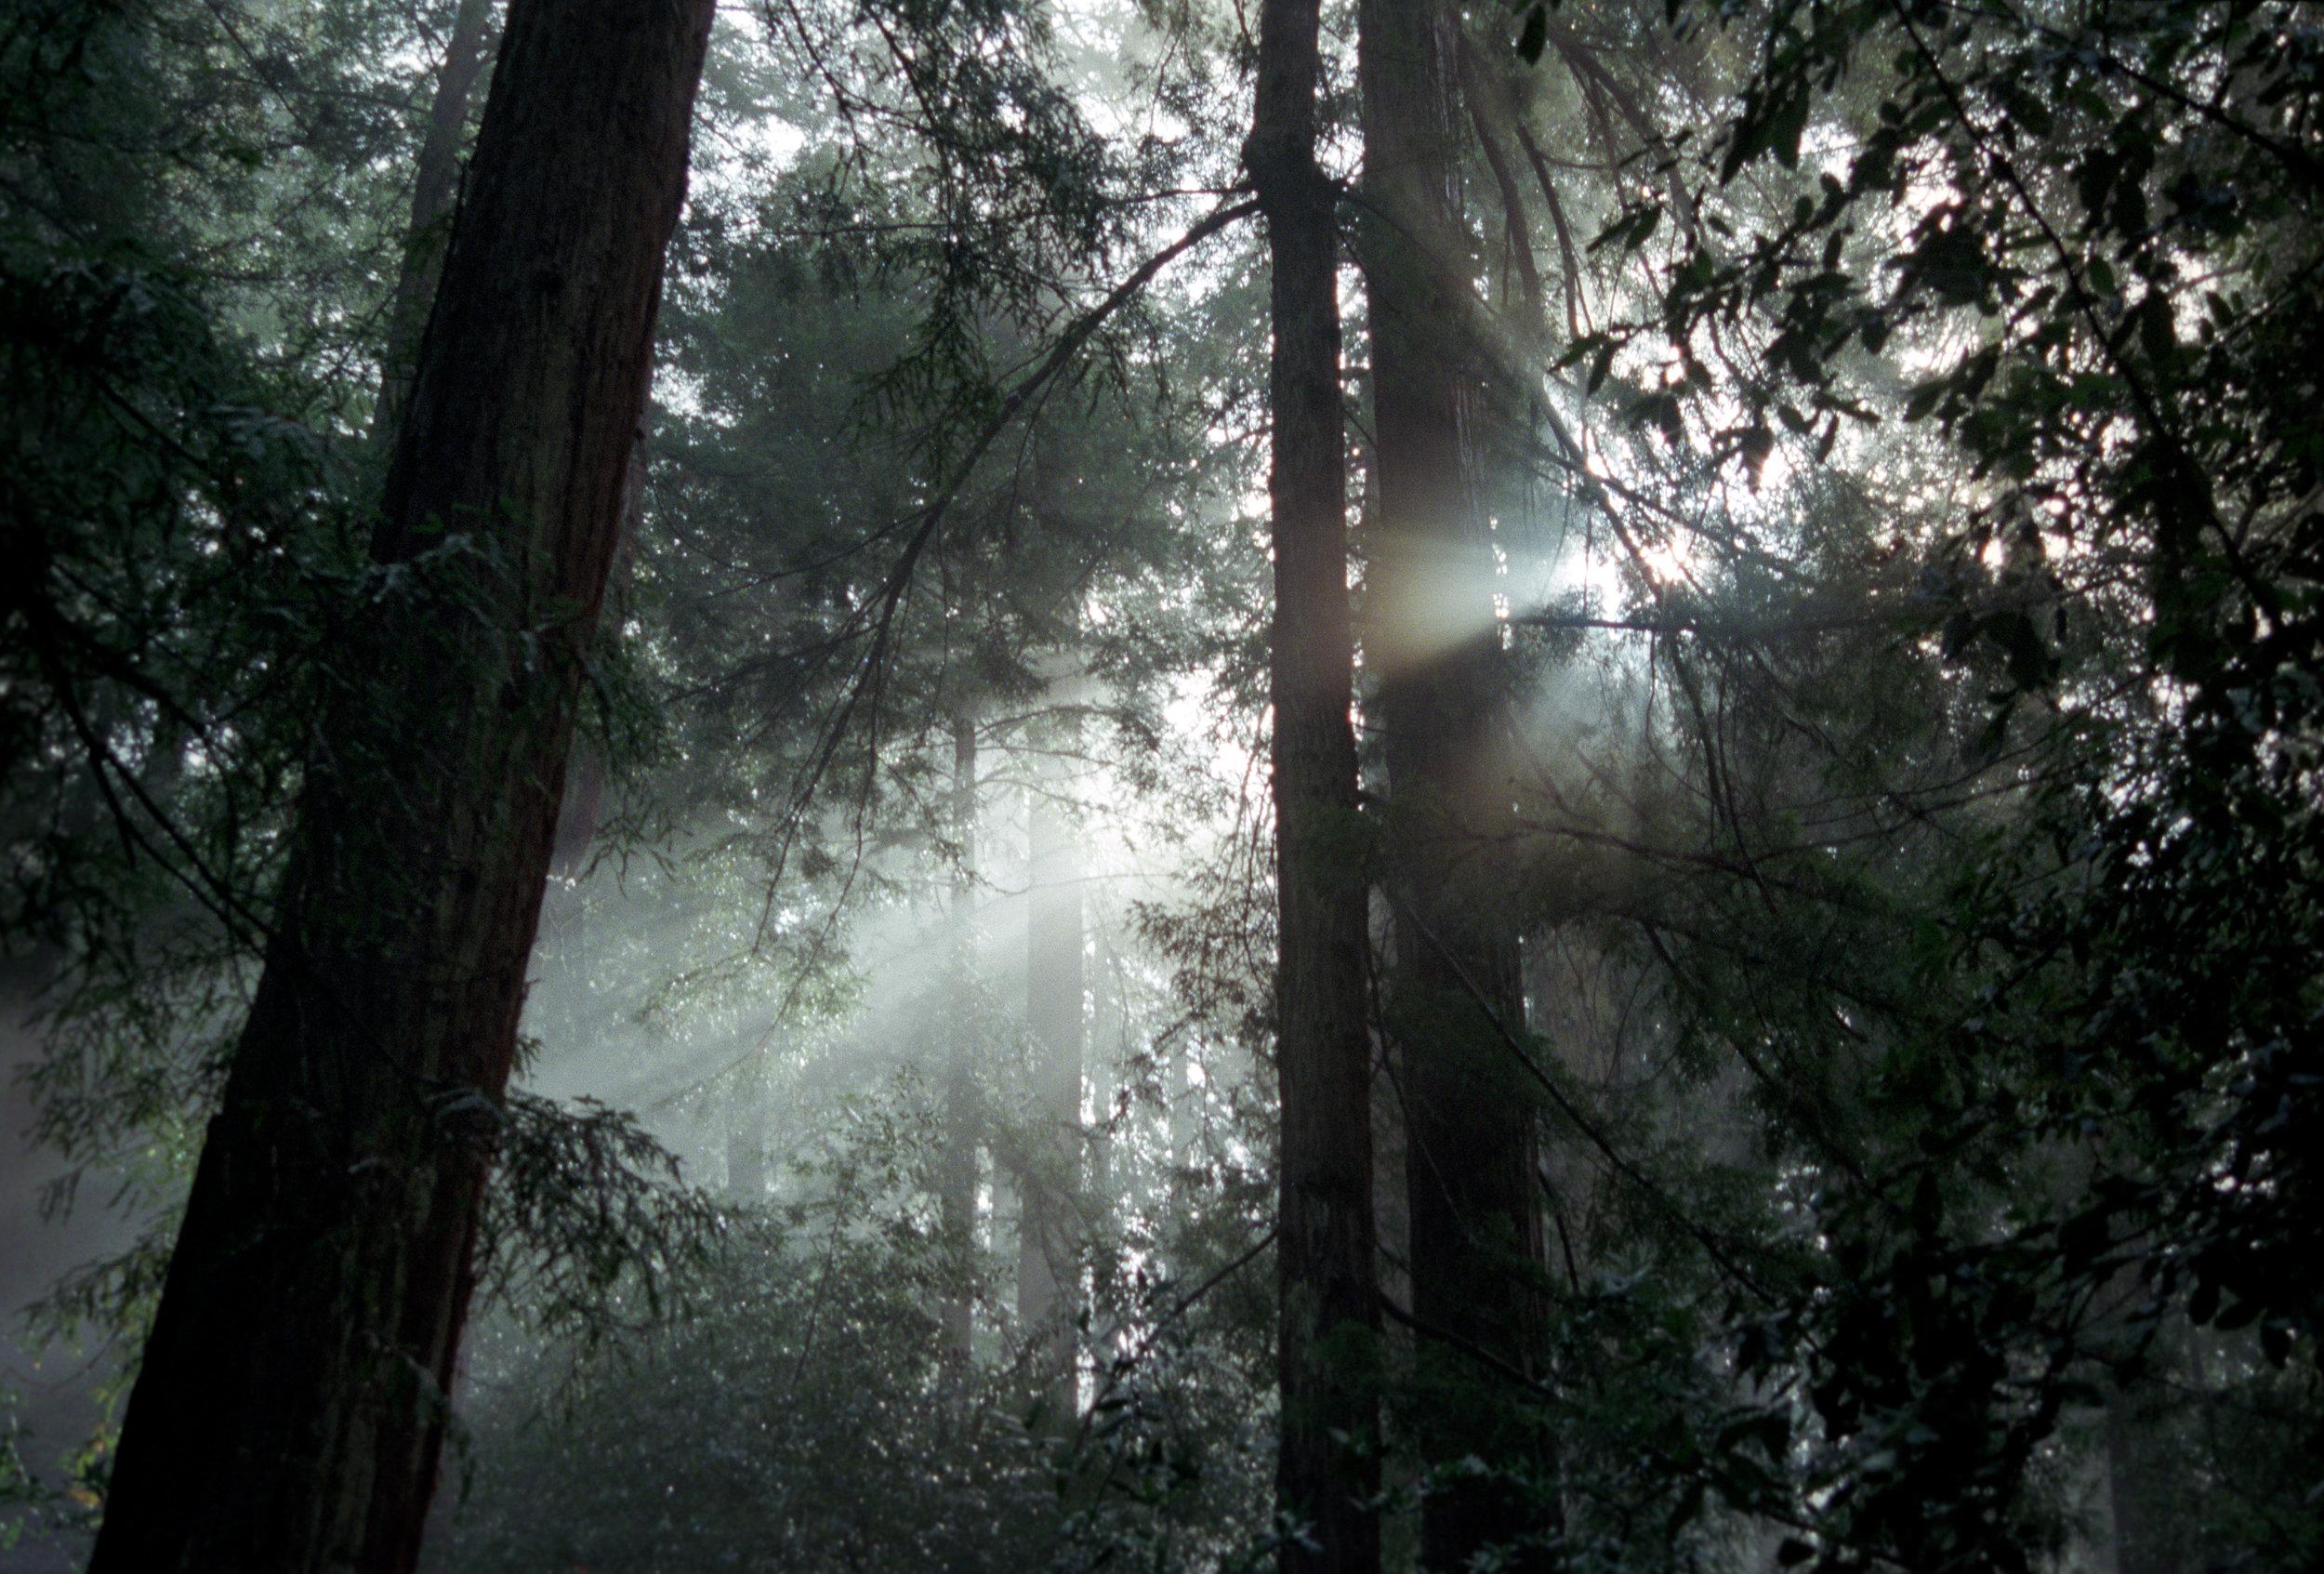 Light-through-tree1_Colour.jpg